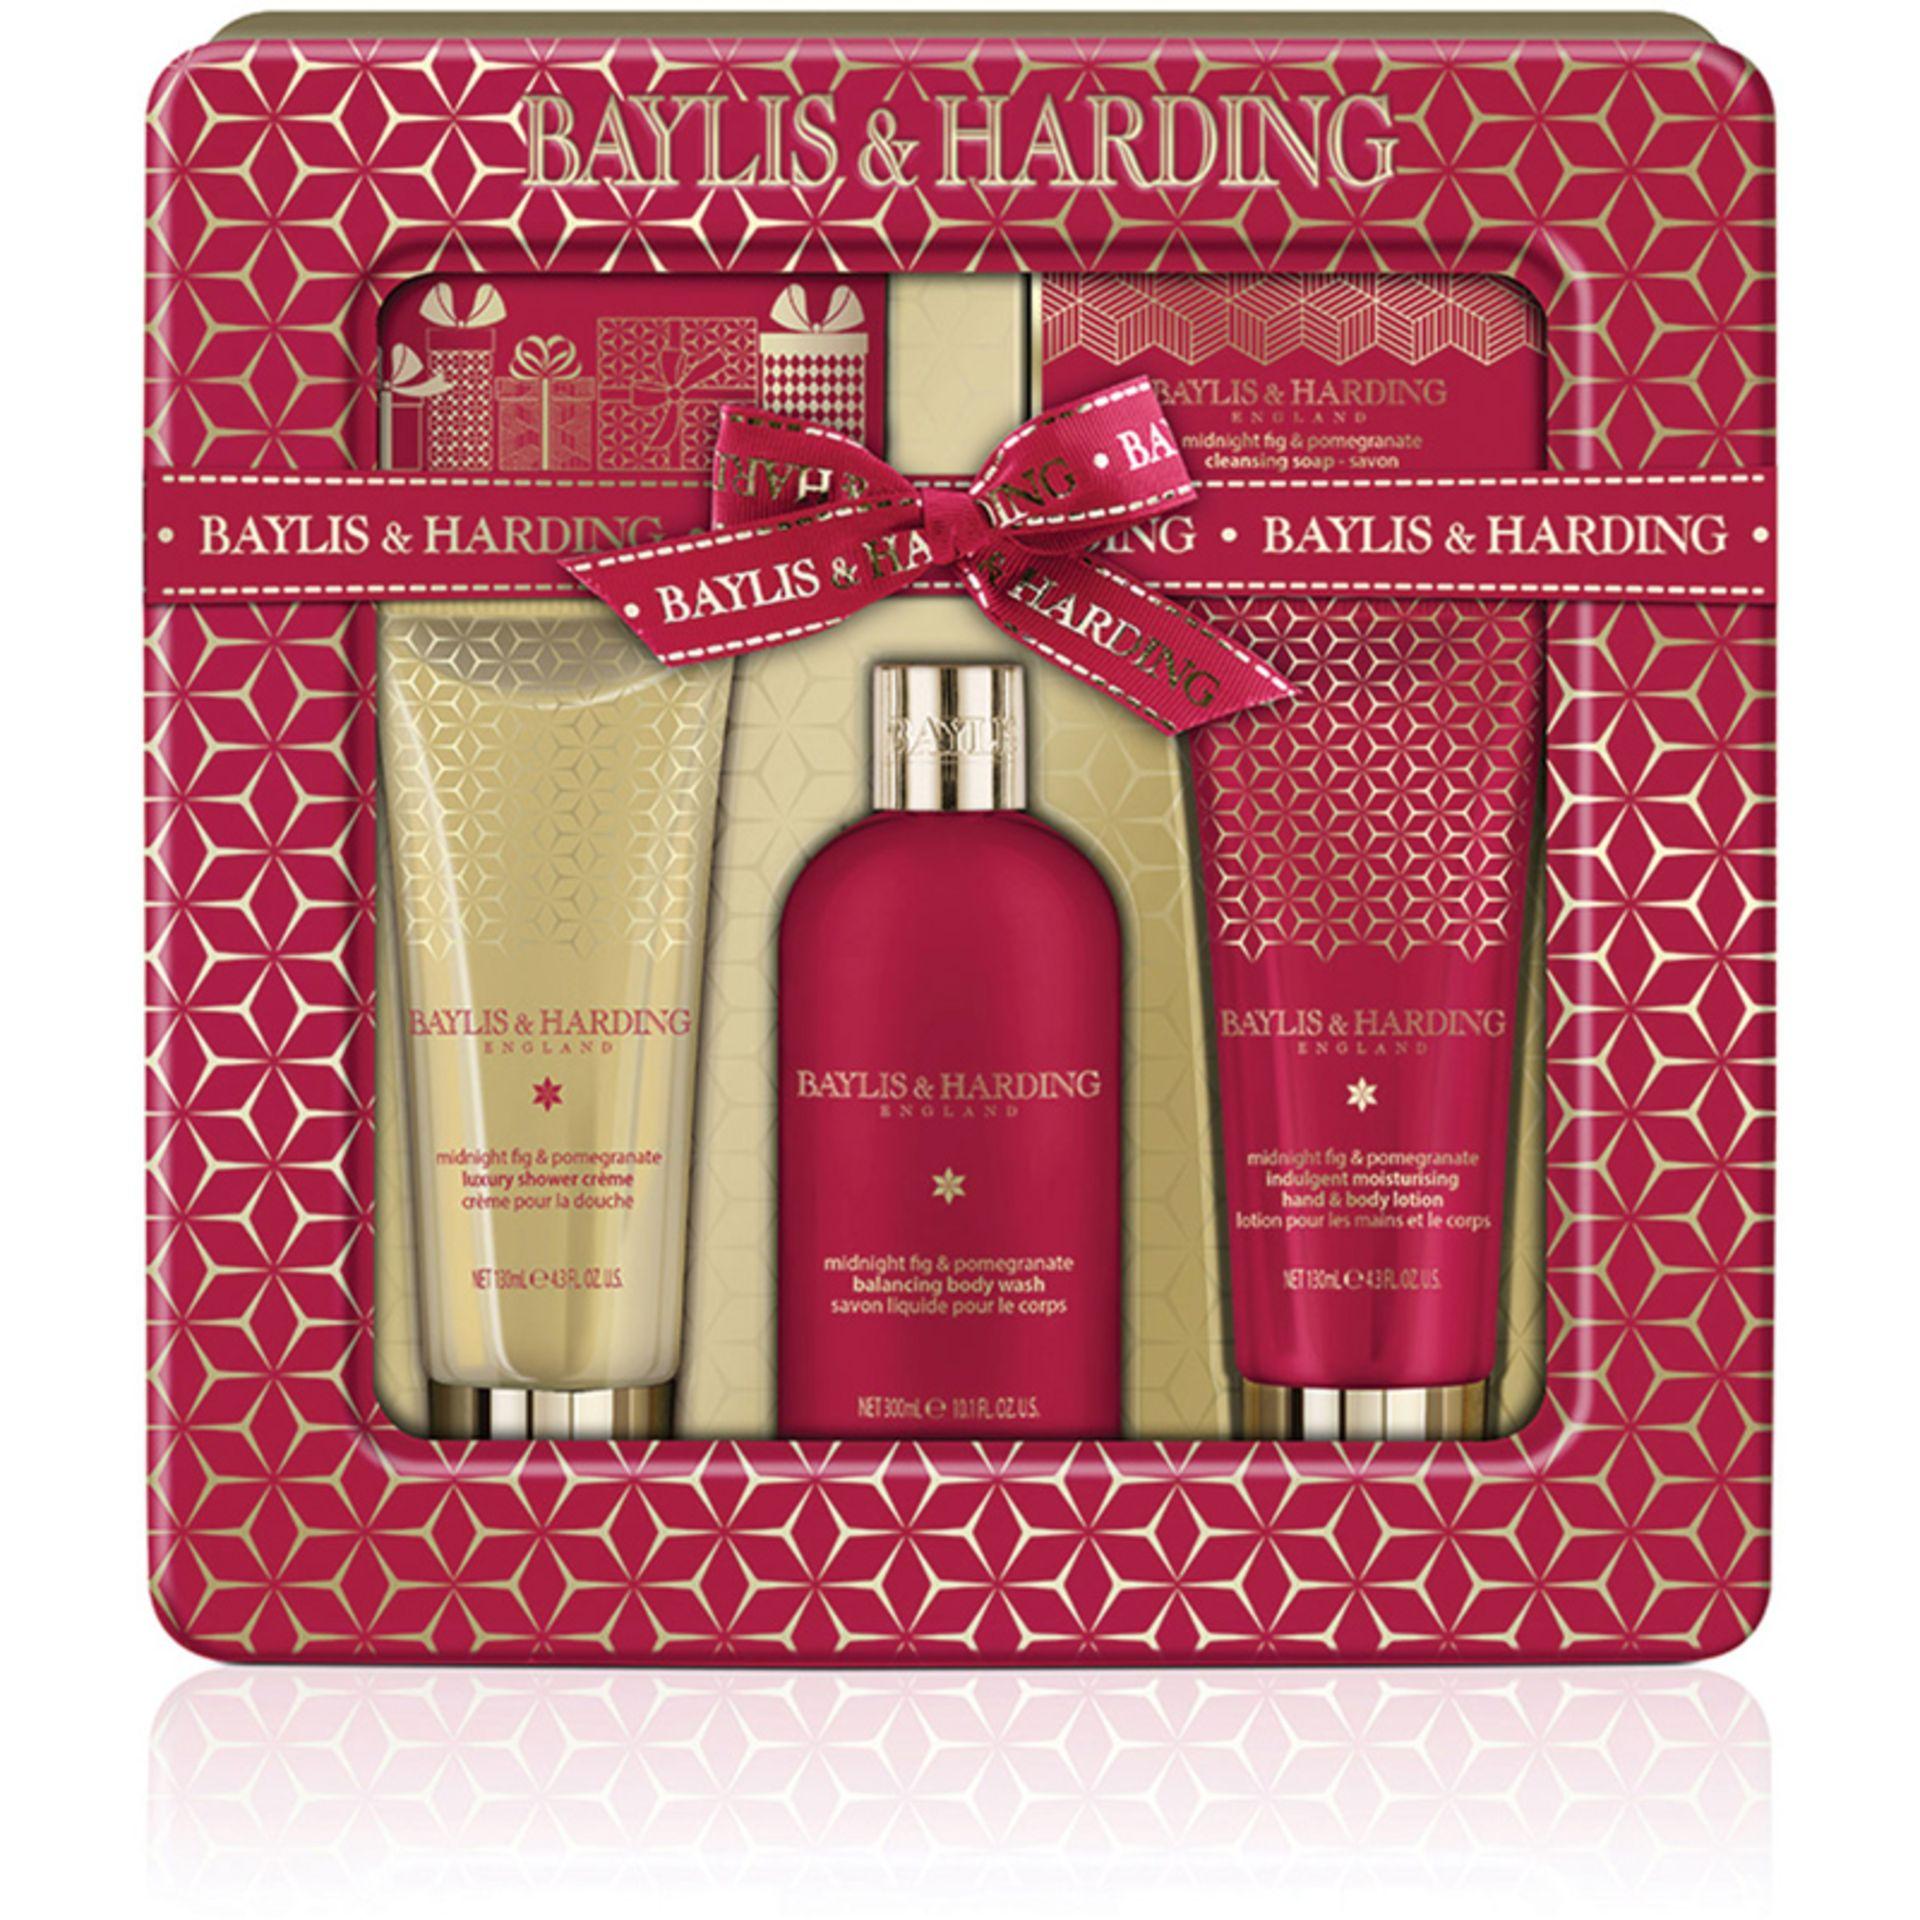 Lot 51522 - V Brand New Baylis & Harding Midnight Fig & Pomegranite Ultimate Bathing Tin Gift Set Inc 300ml Body